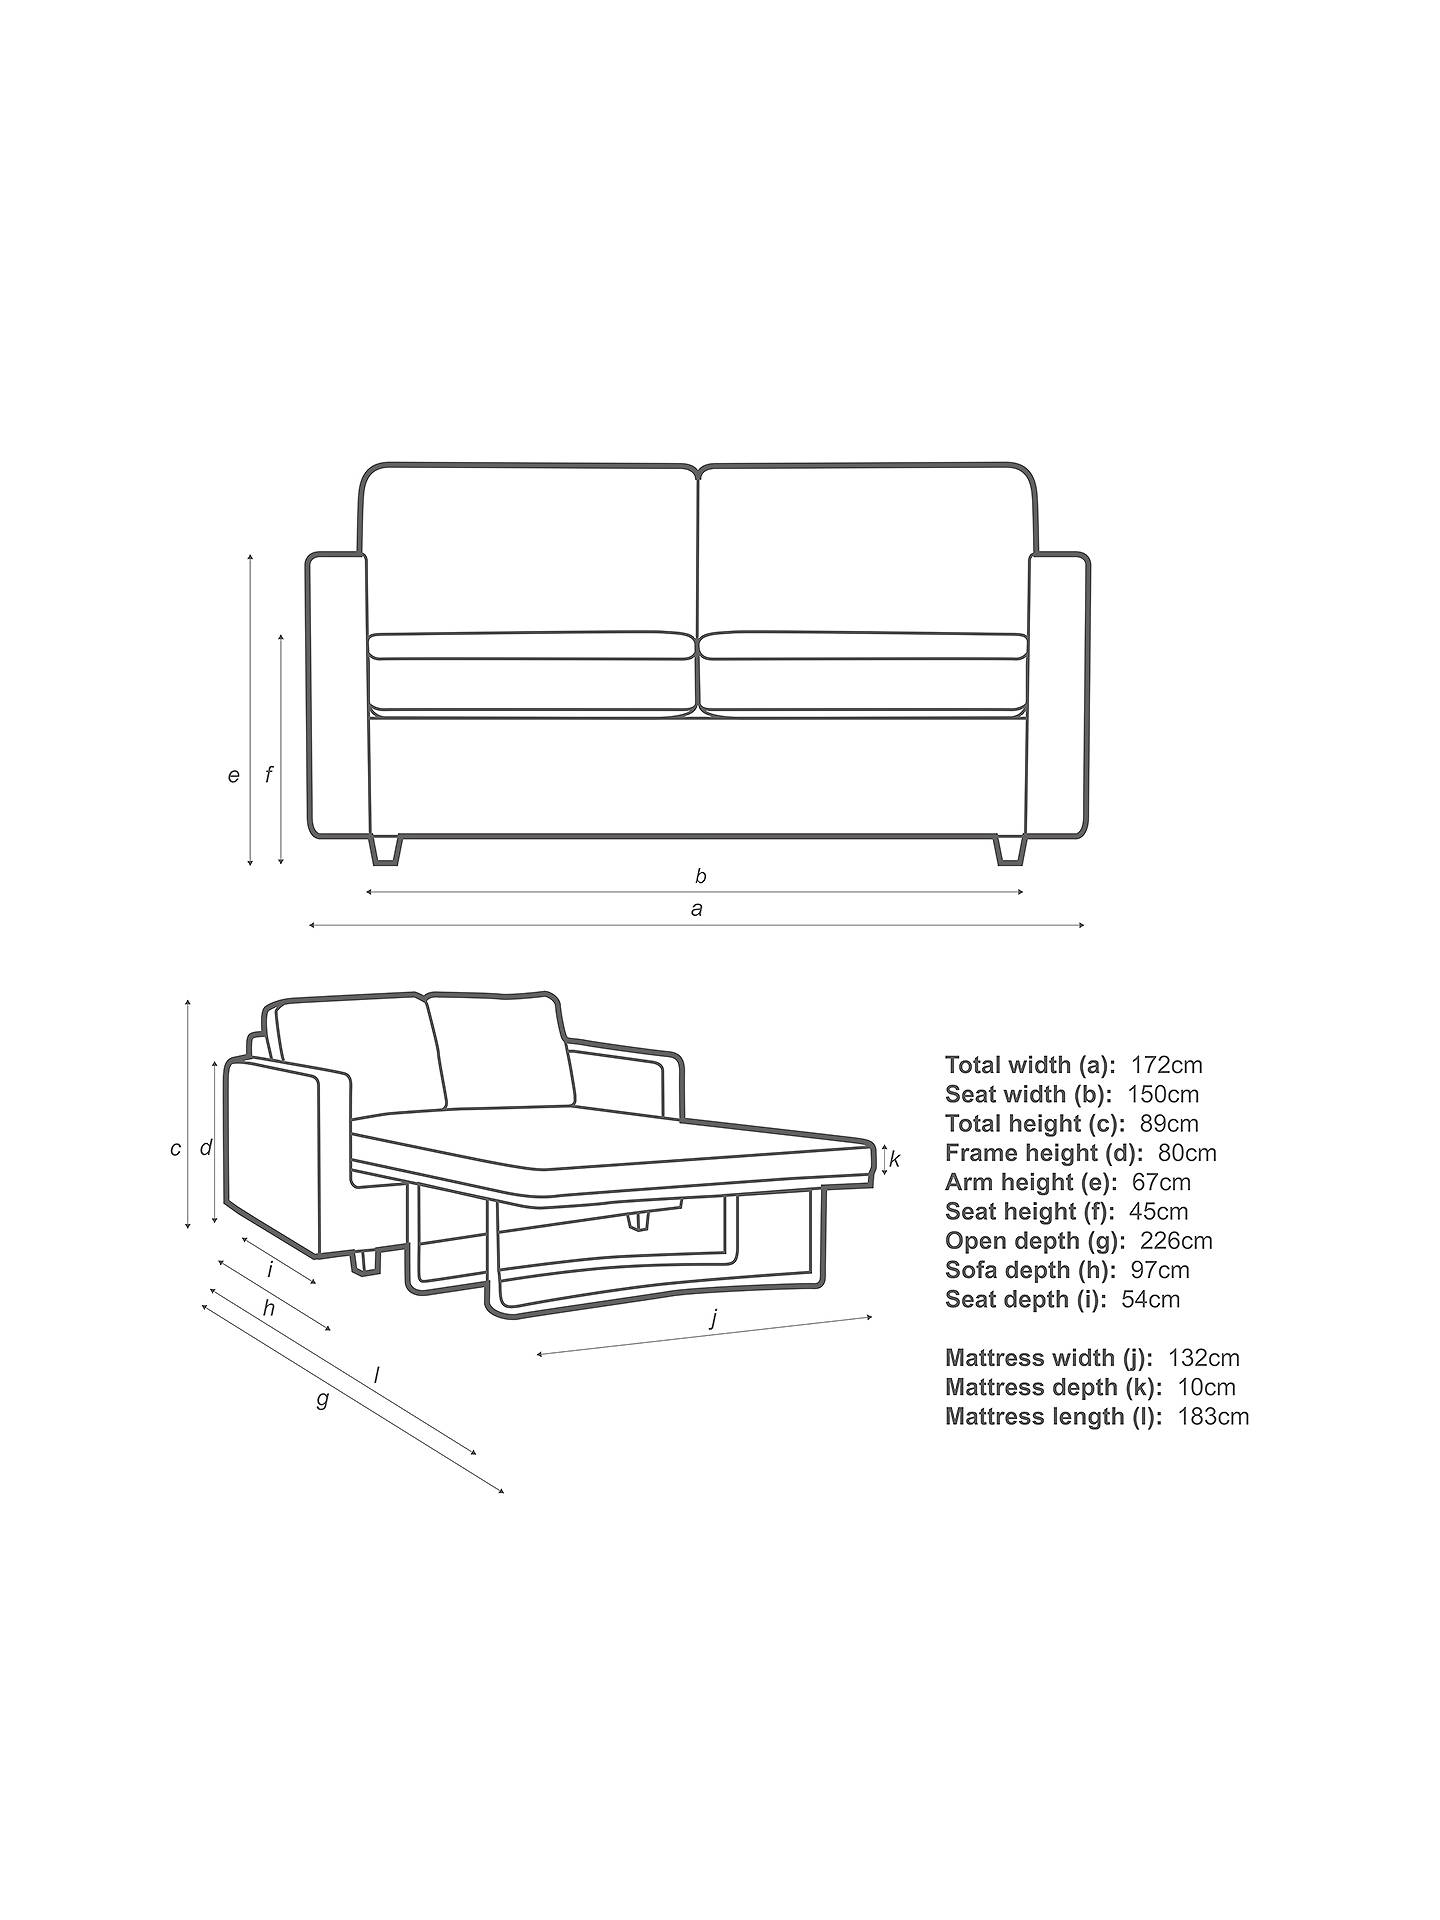 Enjoyable John Lewis Partners Barlow Small 2 Seater Sofa Bed With Pocket Sprung Mattress Erin Midnight Machost Co Dining Chair Design Ideas Machostcouk